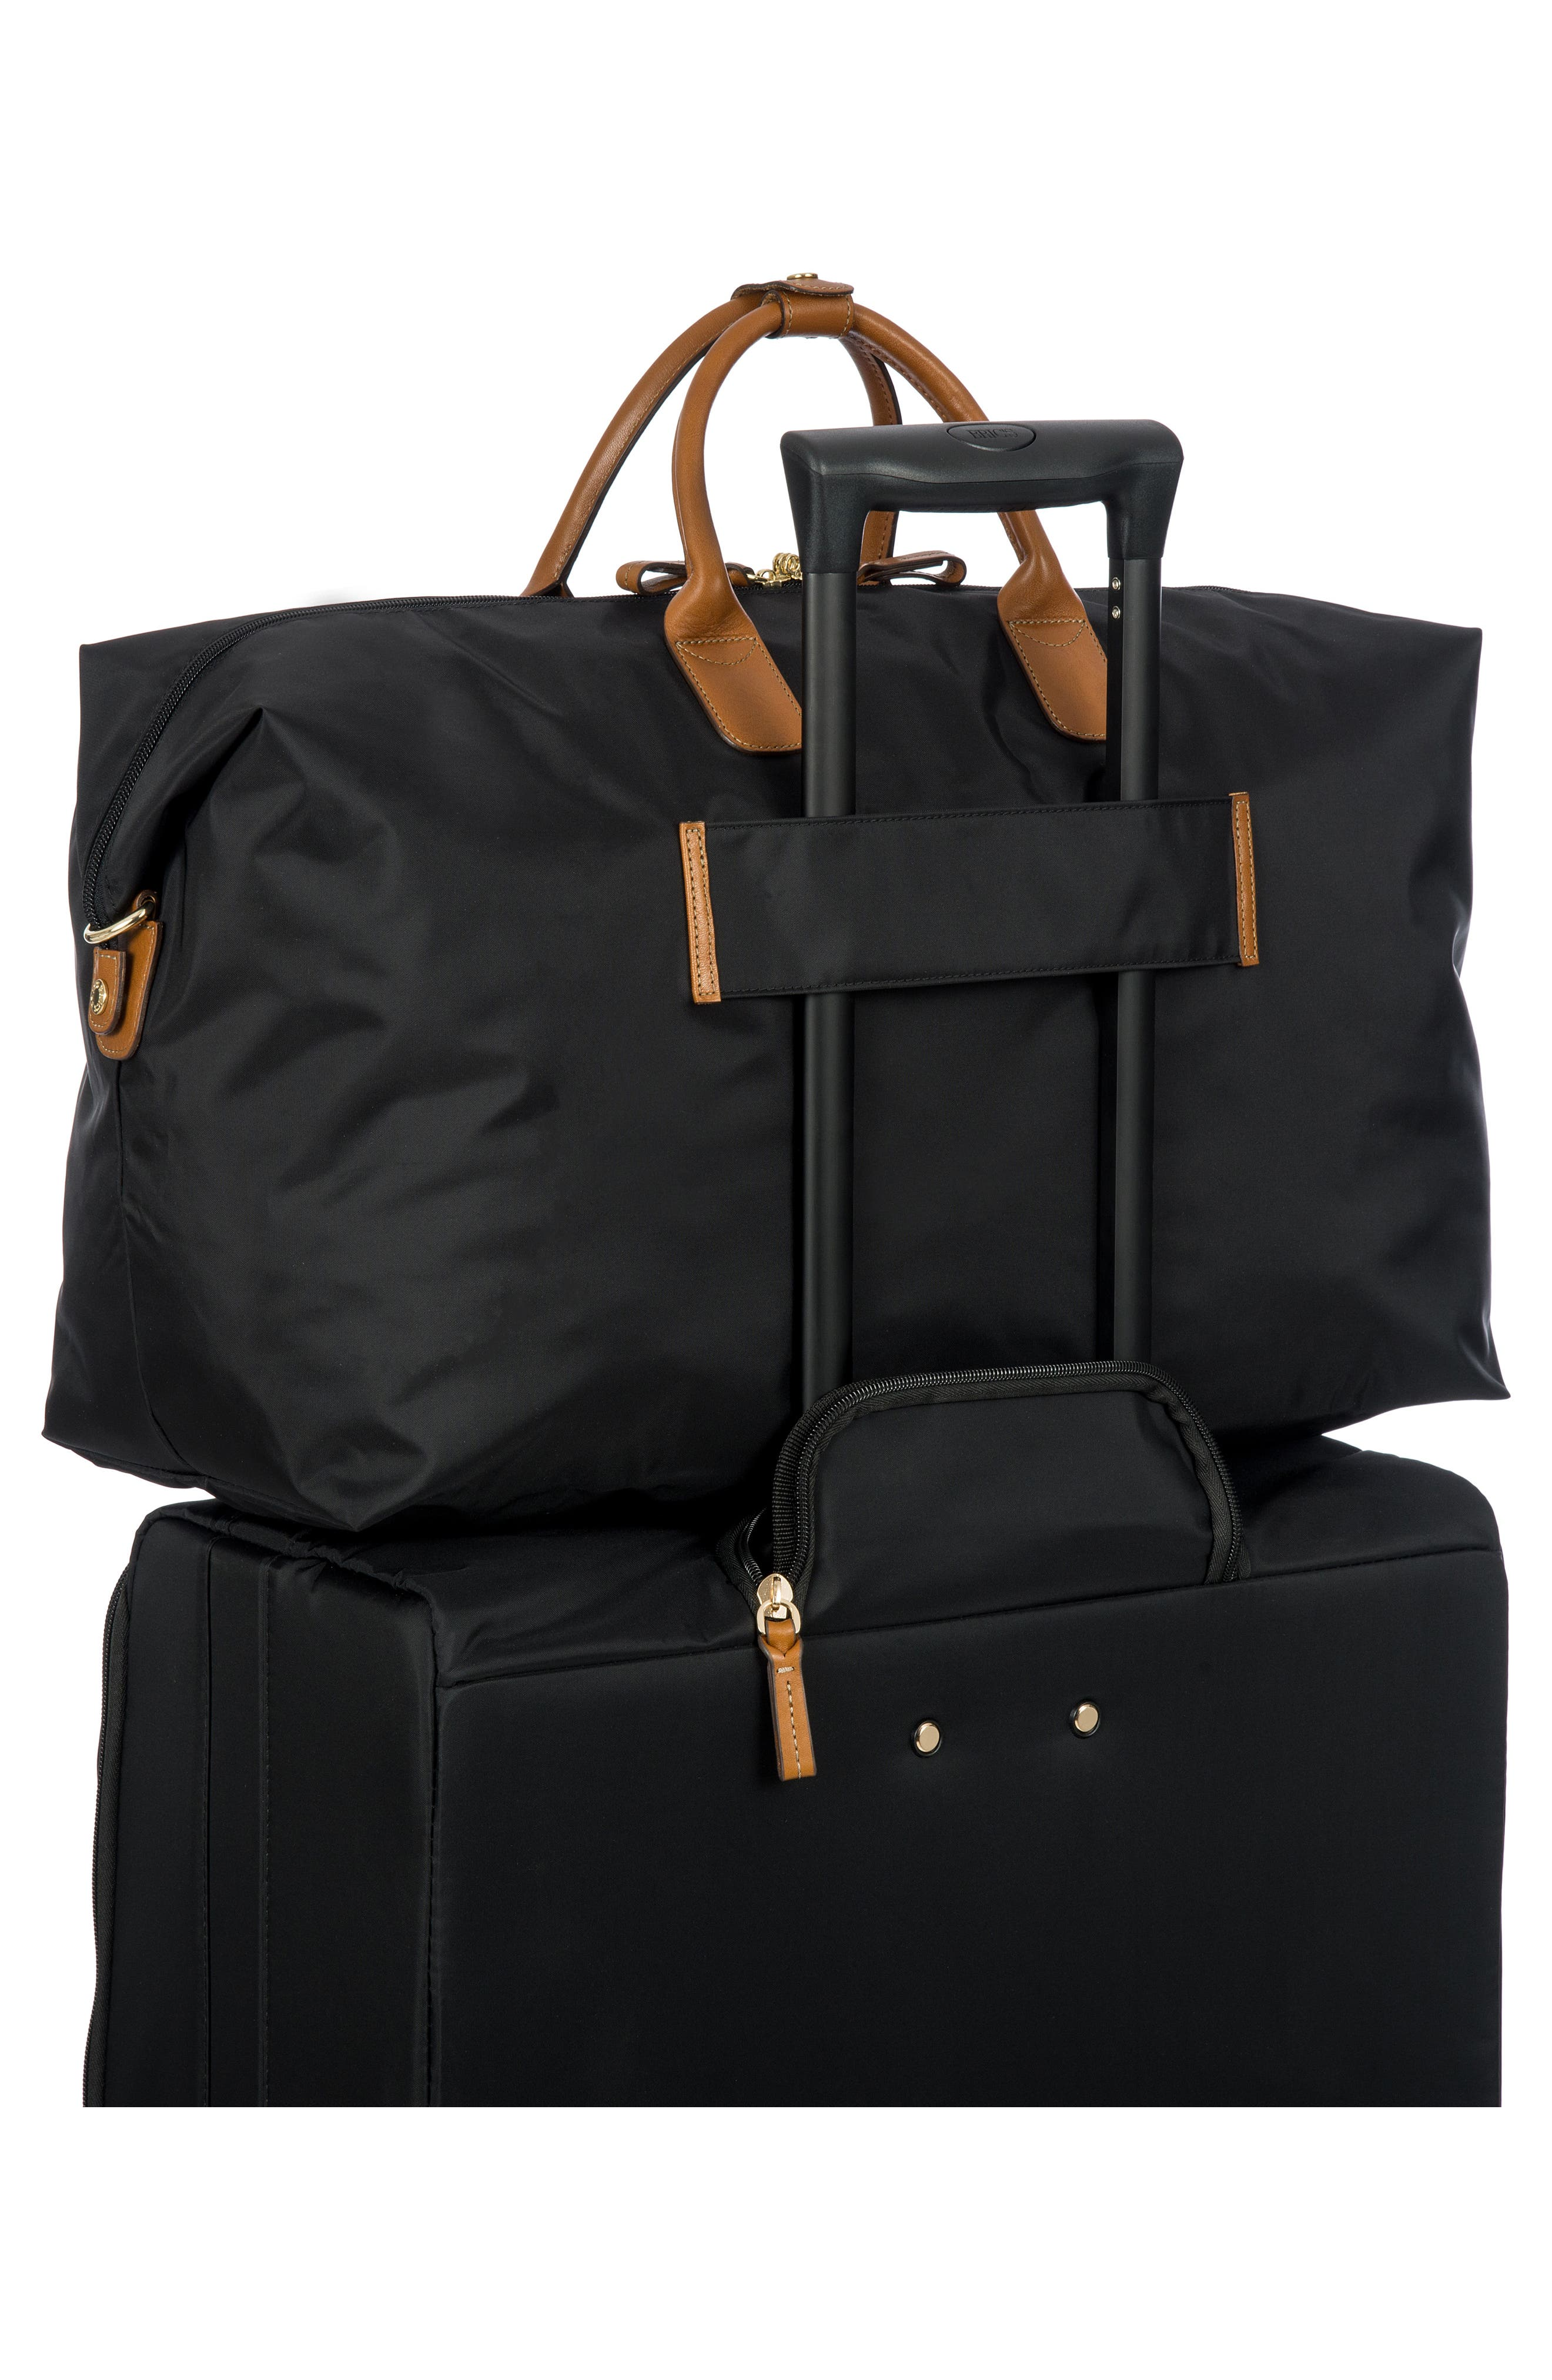 X-Bag Boarding 22-Inch Duffel Bag,                             Alternate thumbnail 2, color,                             BLACK